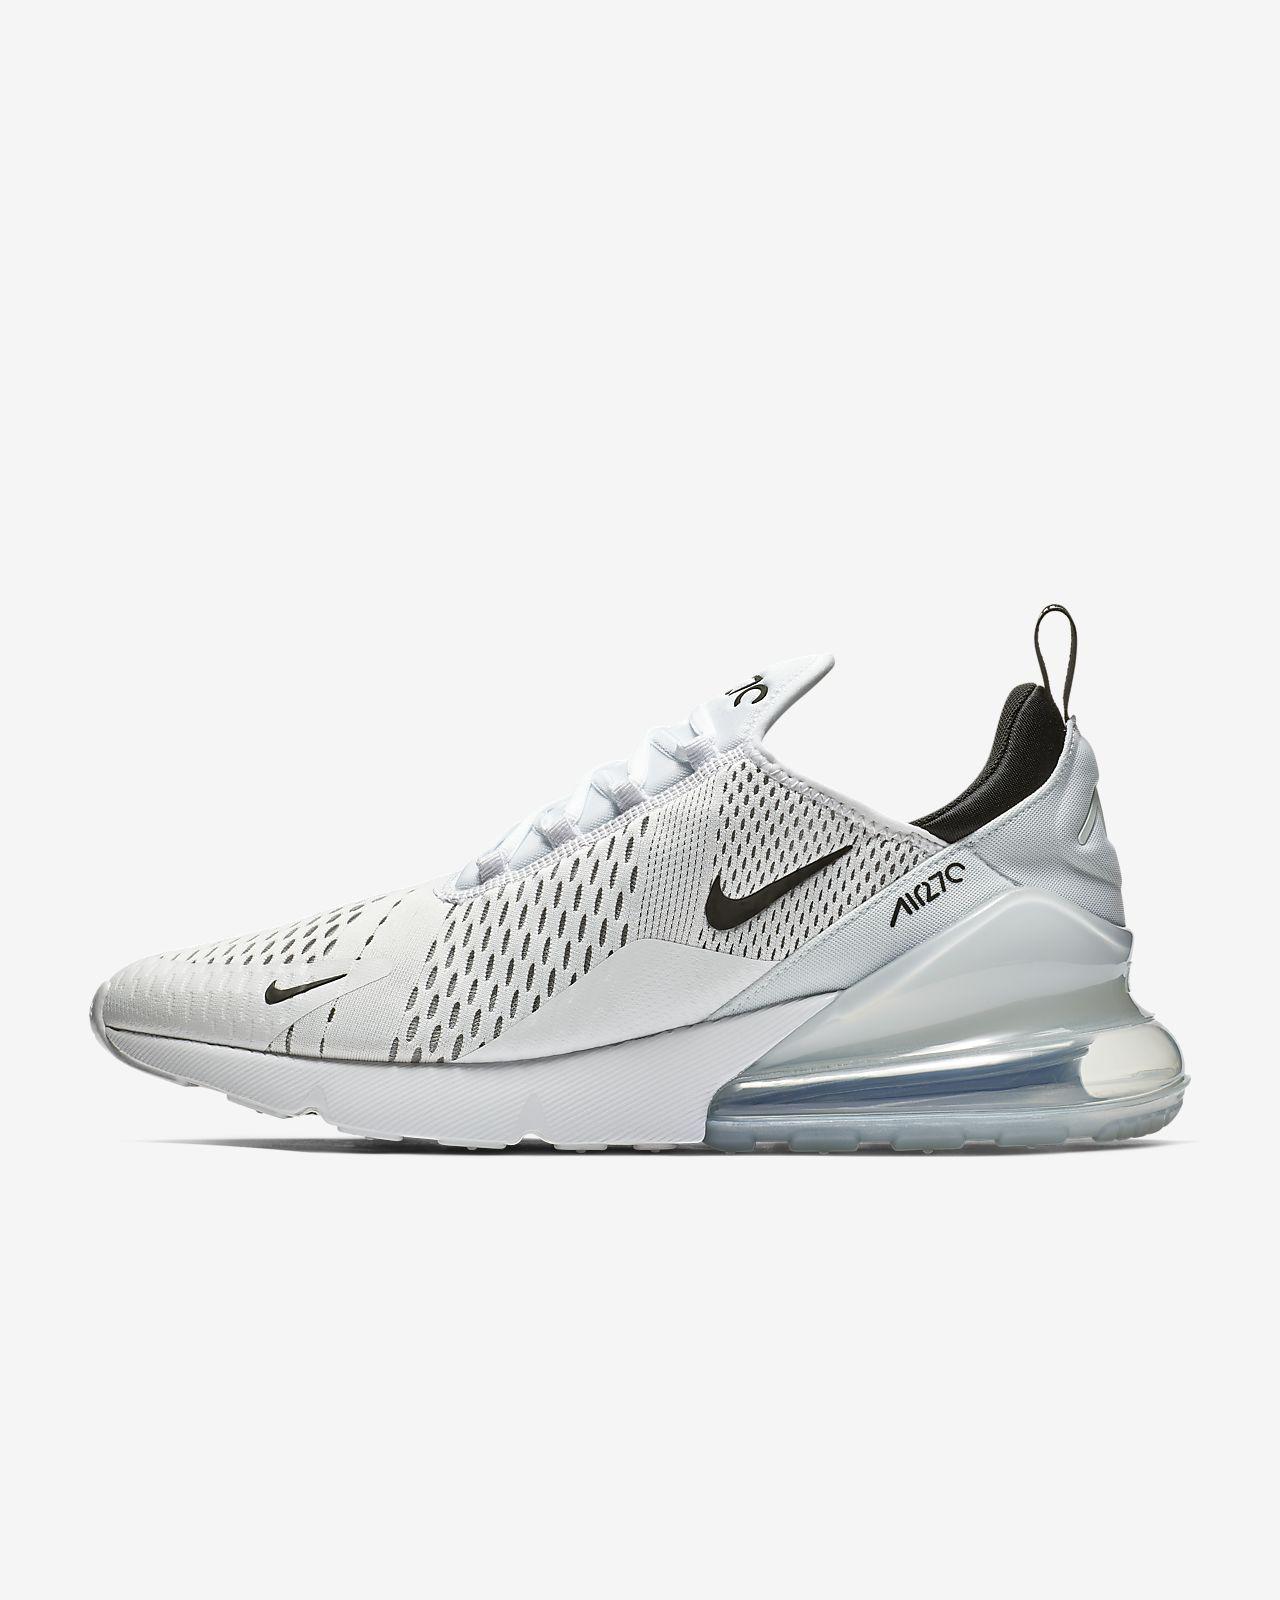 Chaussure Nike Air Max 270 pour Homme